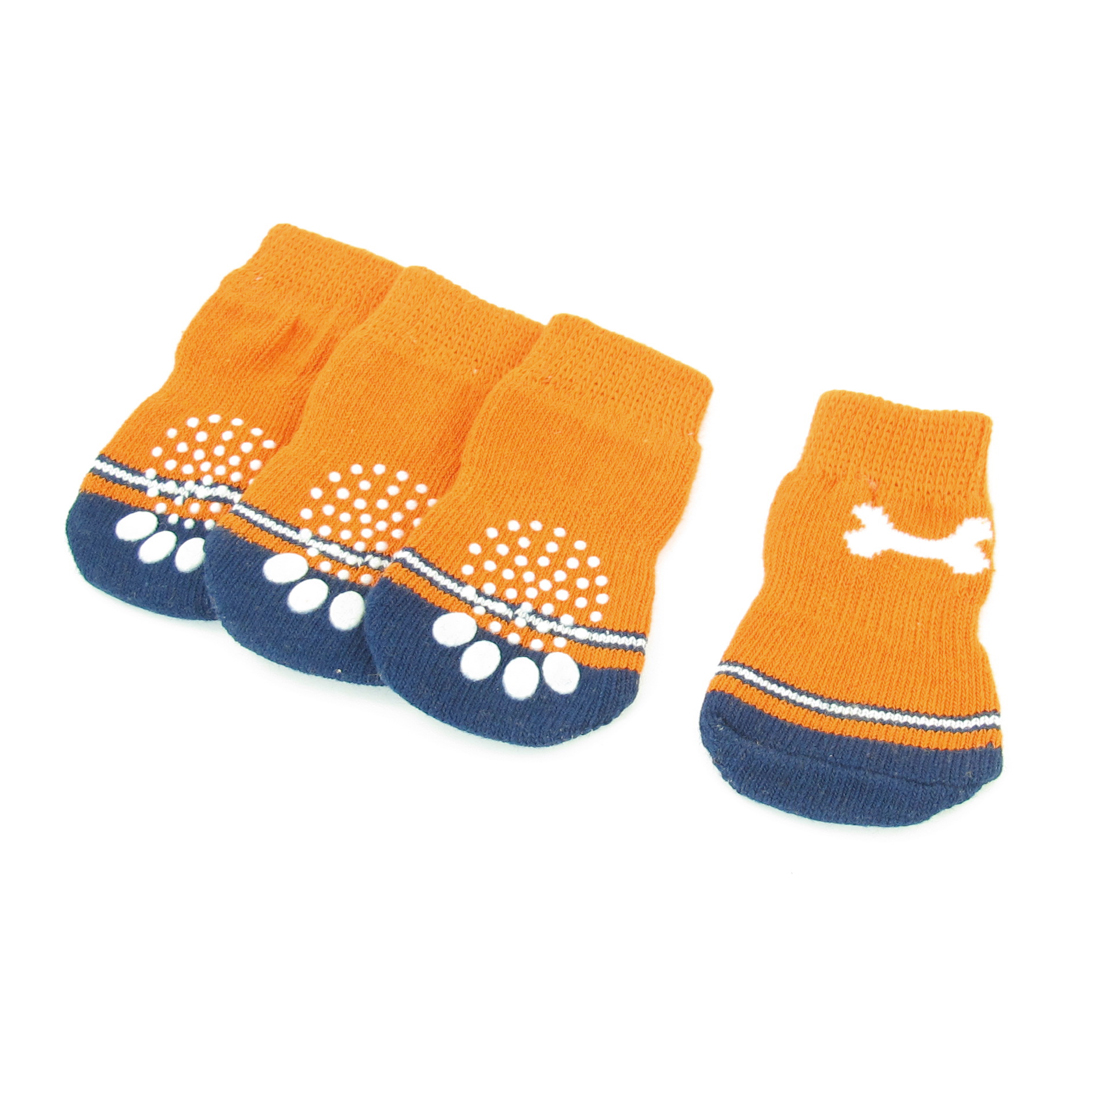 2 Pairs Bone Print Elastic Knitted Pet Dog Doggie Socks Navy Blue Orange Size L